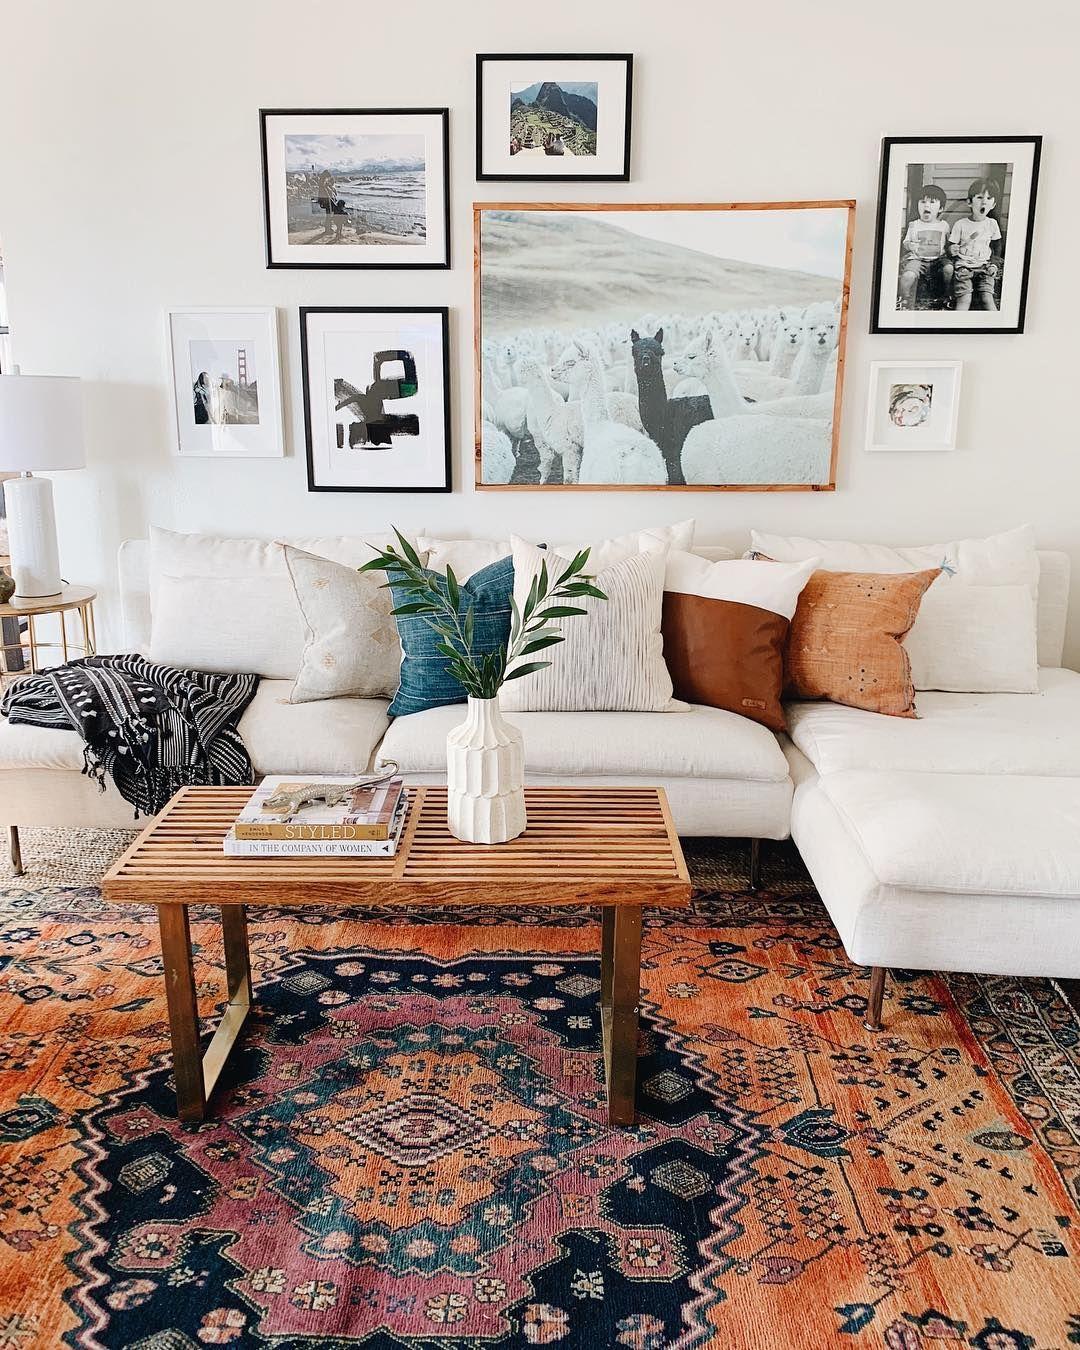 Ikea Soderhamn In Luna Flax Sofa Slipcovers Rebeccaandgenevieve Sofa Sofacovers Home Homedecor Homedec Living Room Designs Home Decor Chic Home Decor #slipcovered #living #room #sets